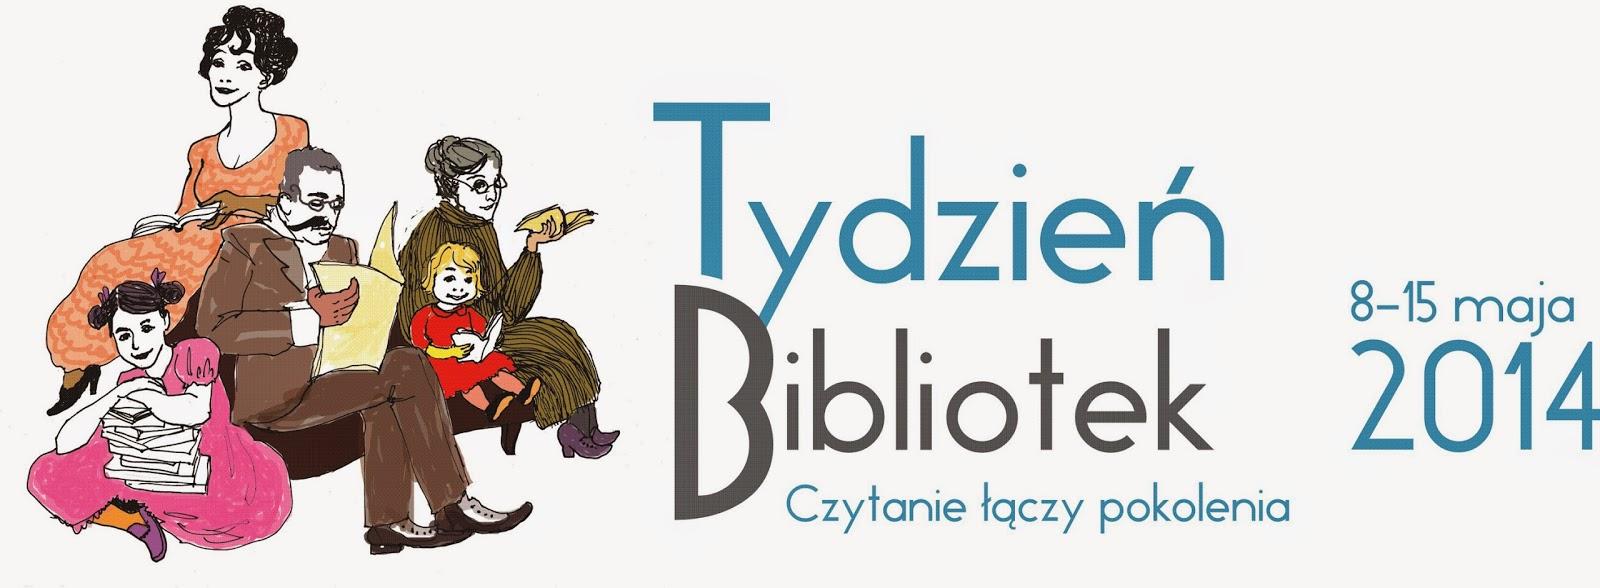 http://www.biblioteka-dg.pl/index.php/1wyd/369-tydzien-bibliotek-2014